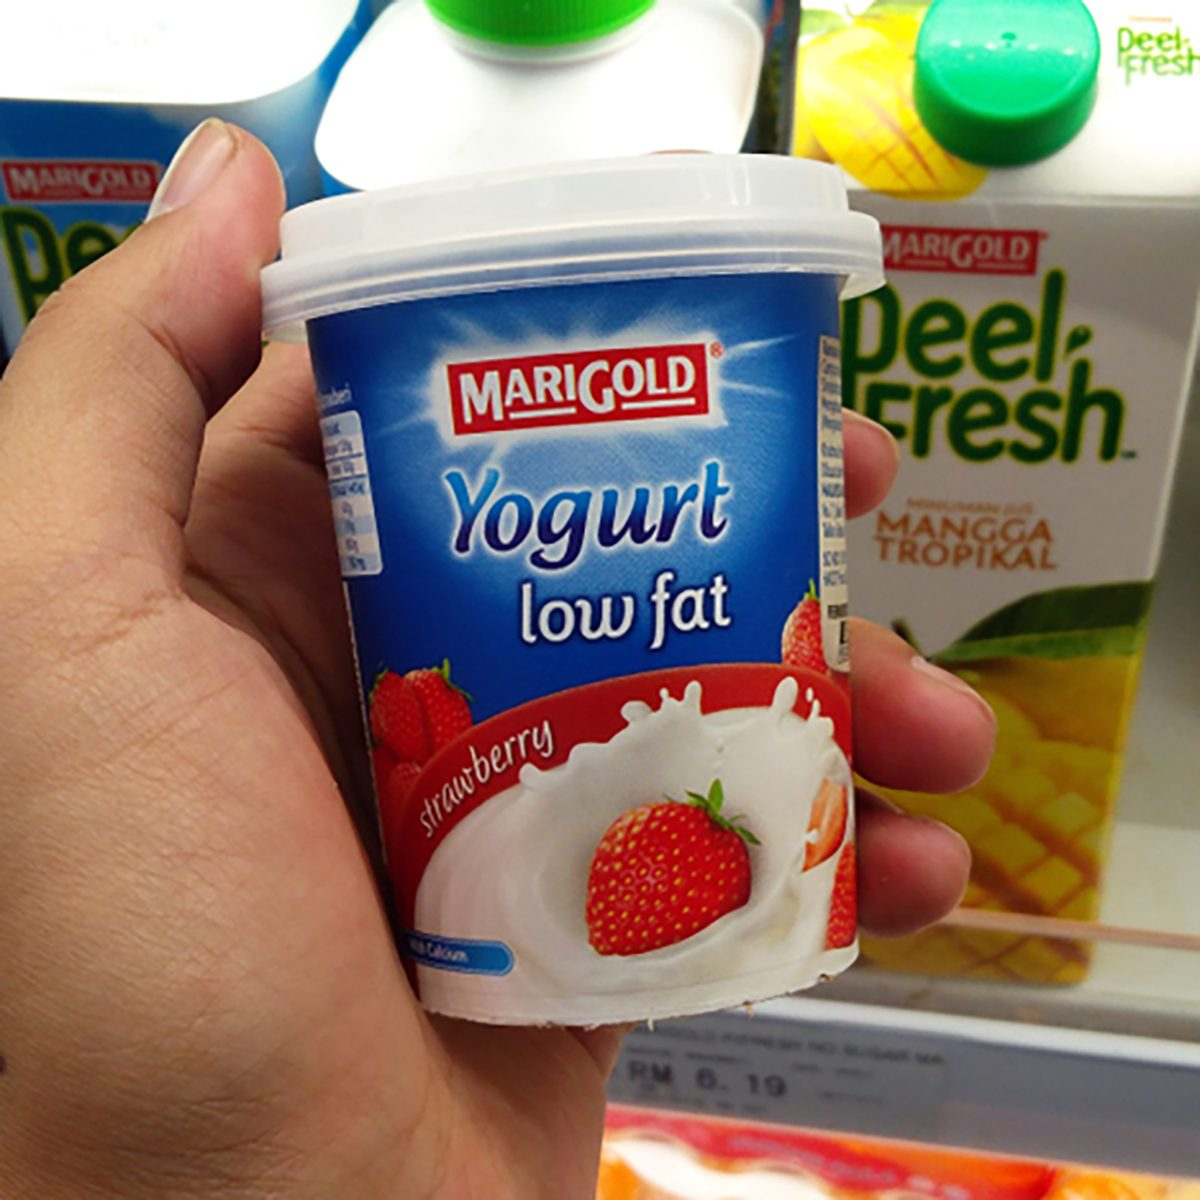 KLANG, MALAYSIA - APRIL 1, 2018 : Hand holding a cup of Marigold Low Fat Yogurtin hypermarket.